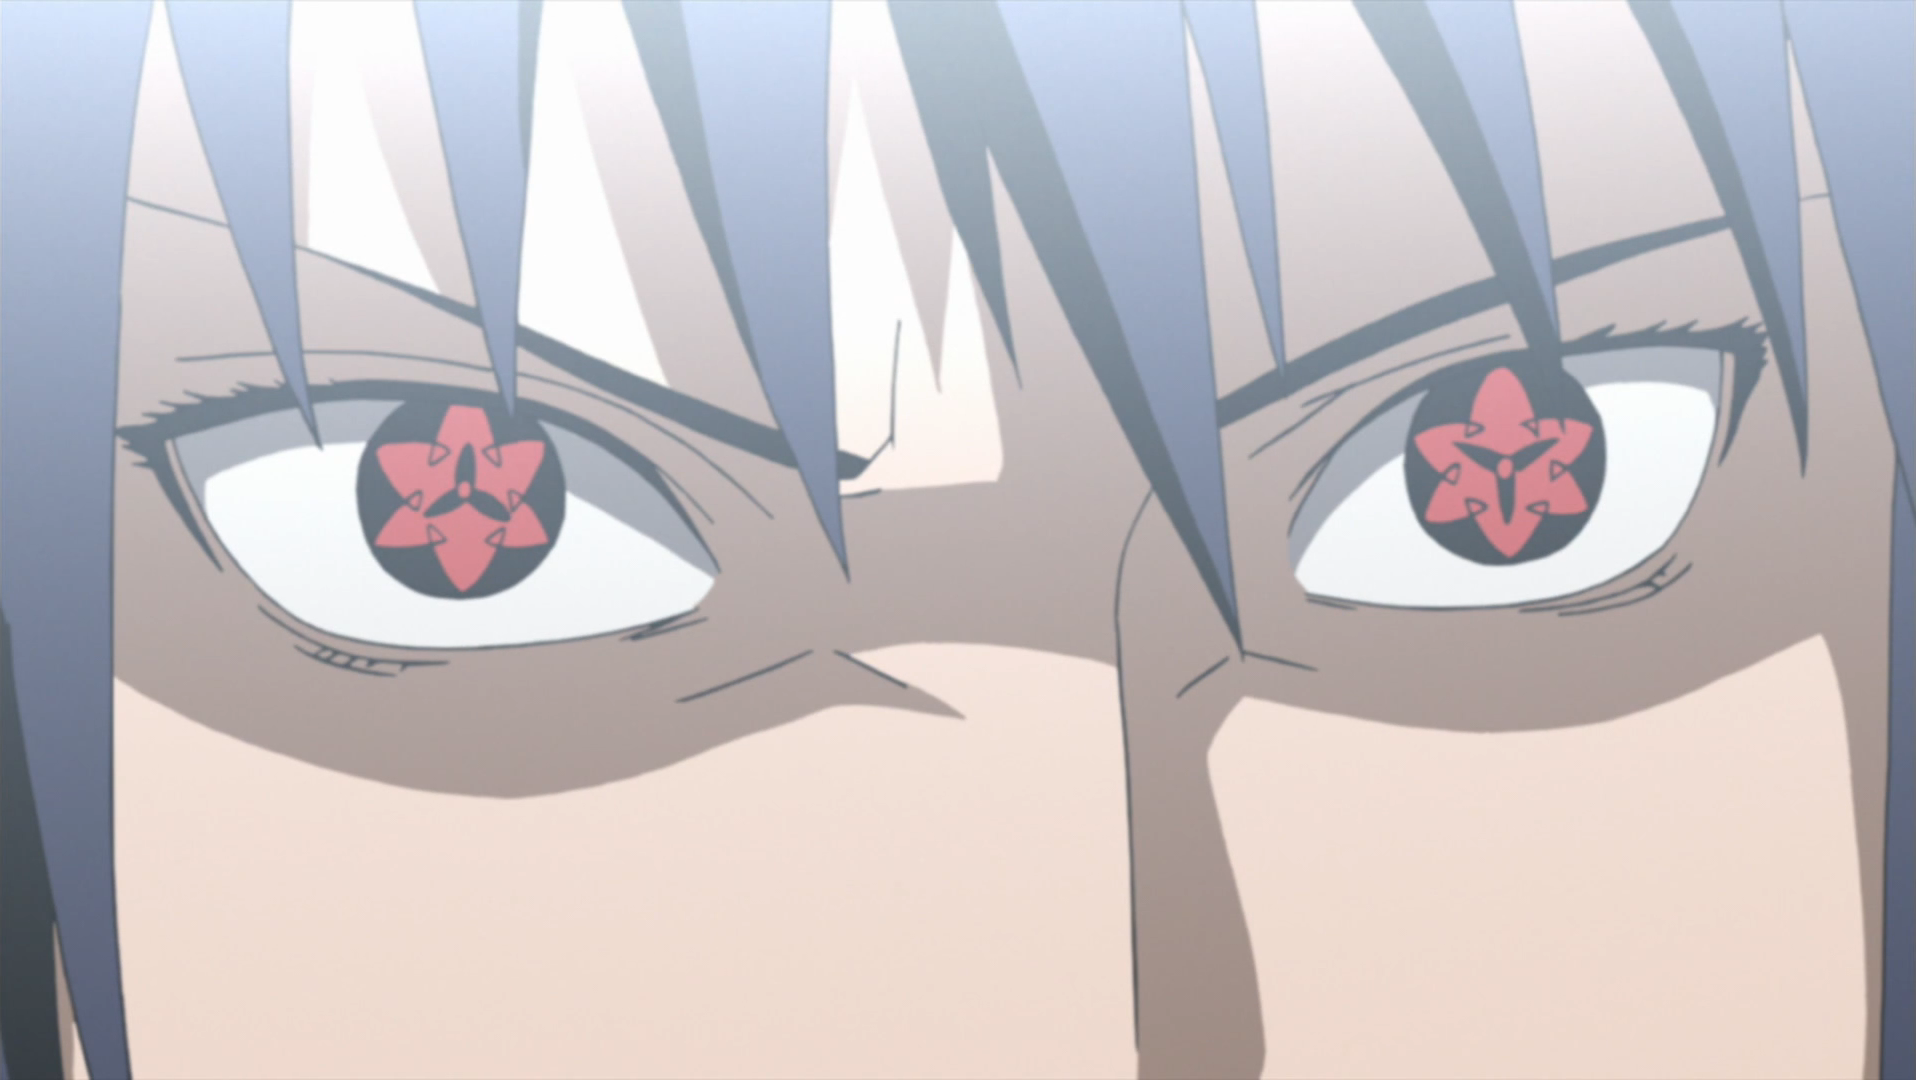 Sharingan naruto wiki fandom powered by wikia - Naruto pour les adultes ...